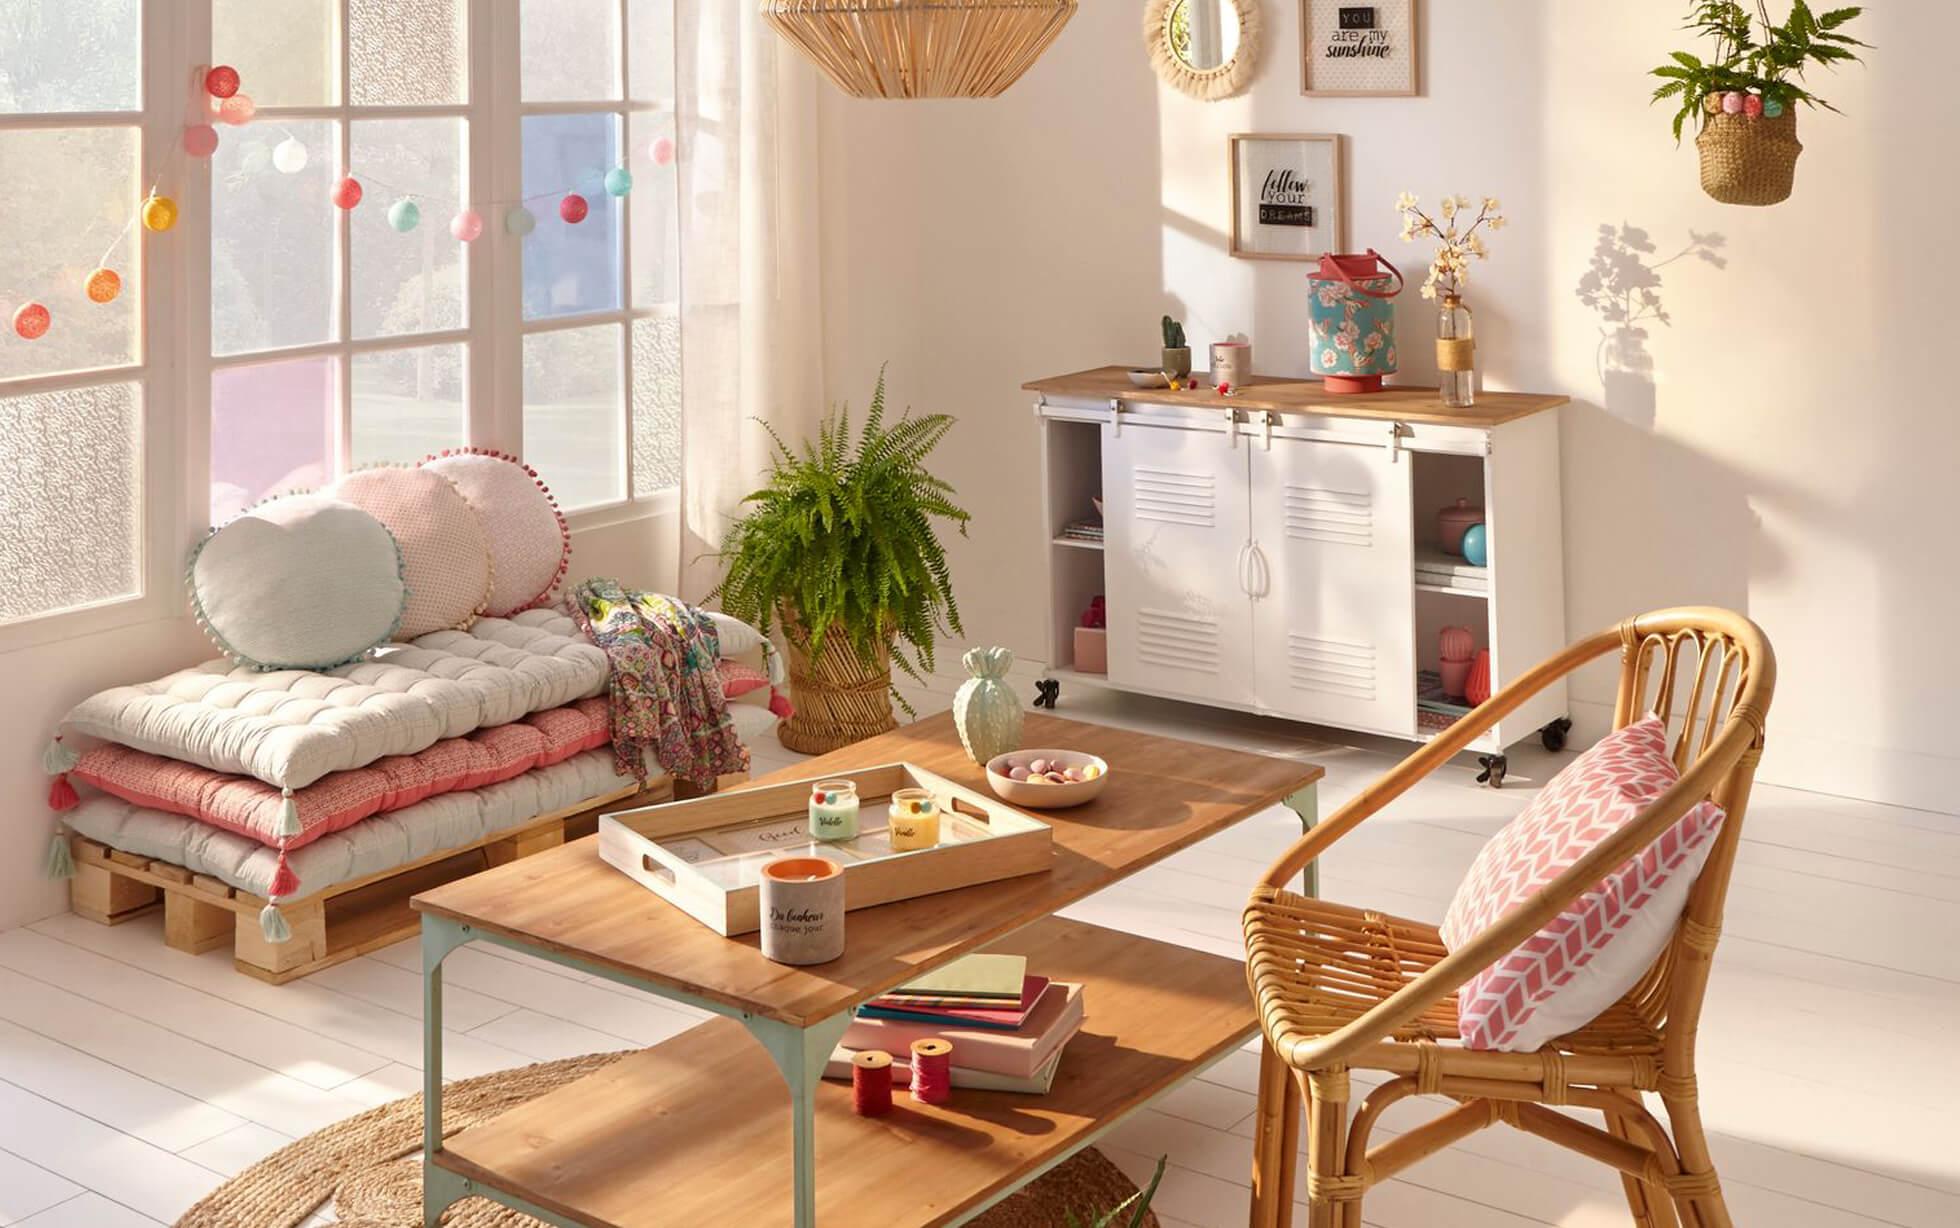 Aménager un petit salon : nos conseils - Eminza